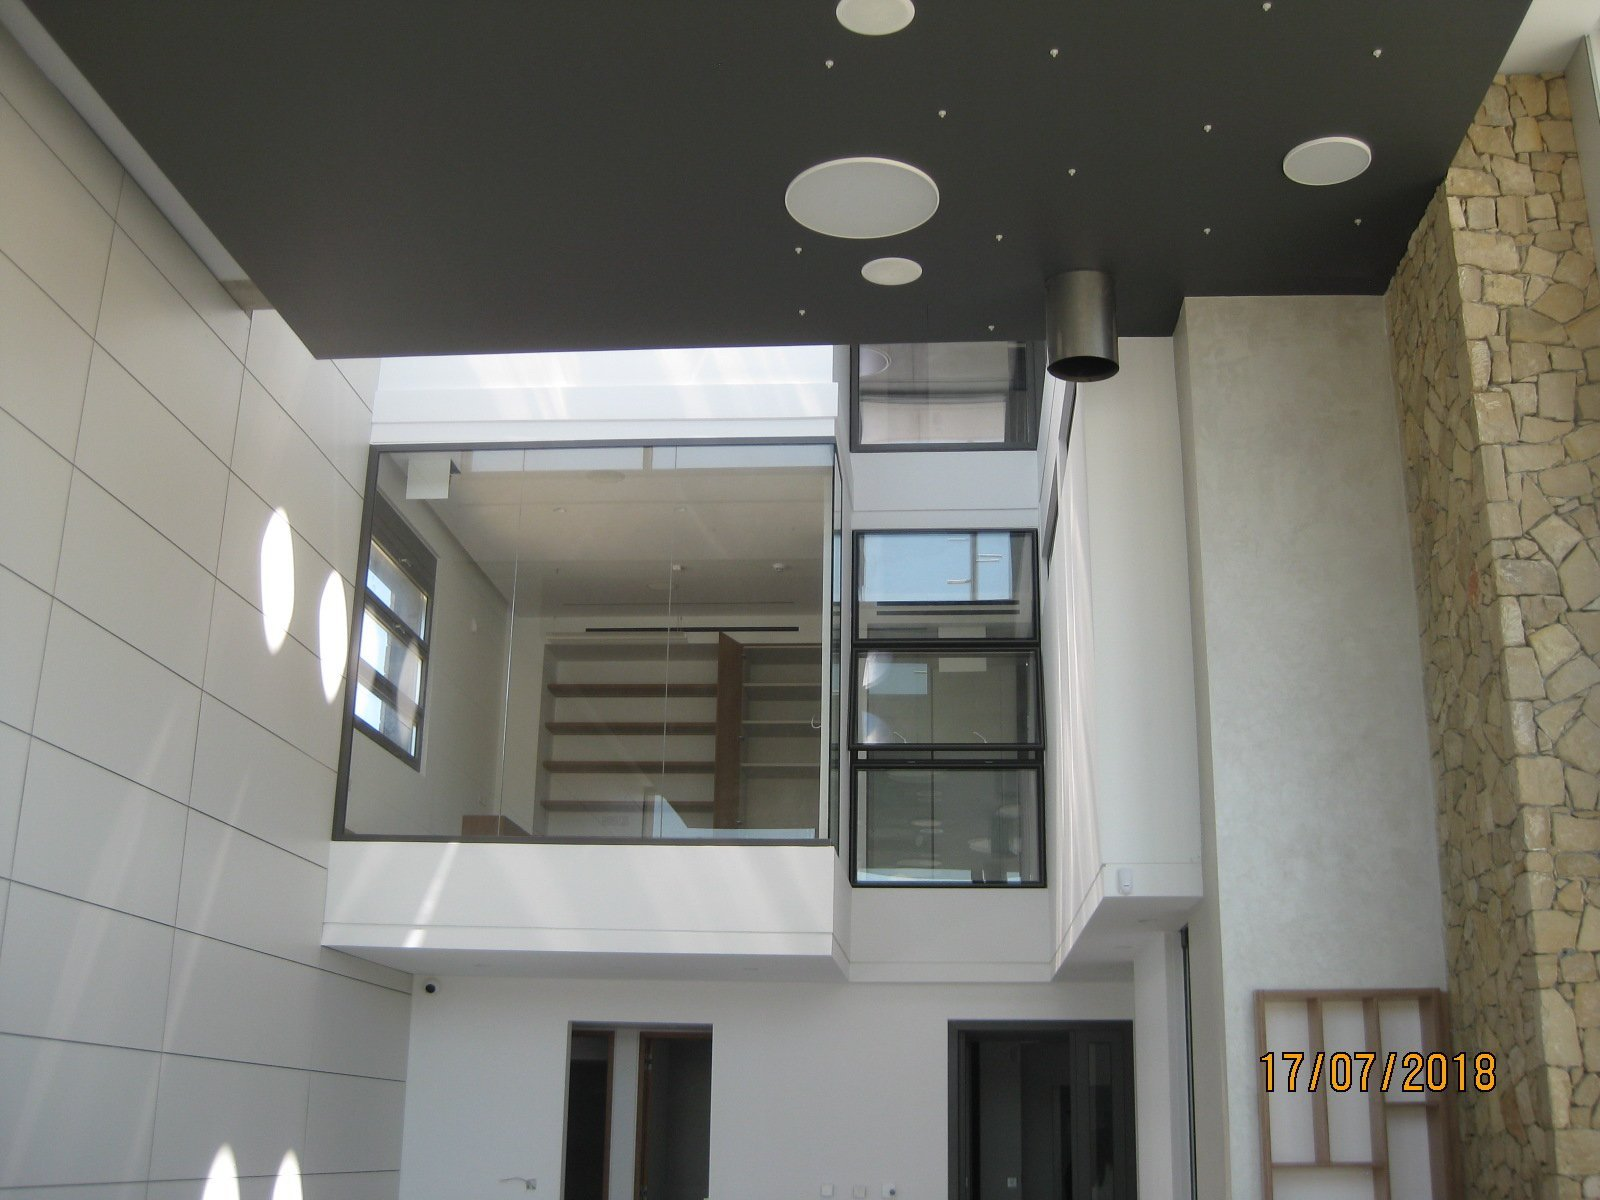 Praxis Designs Solar House 4.1